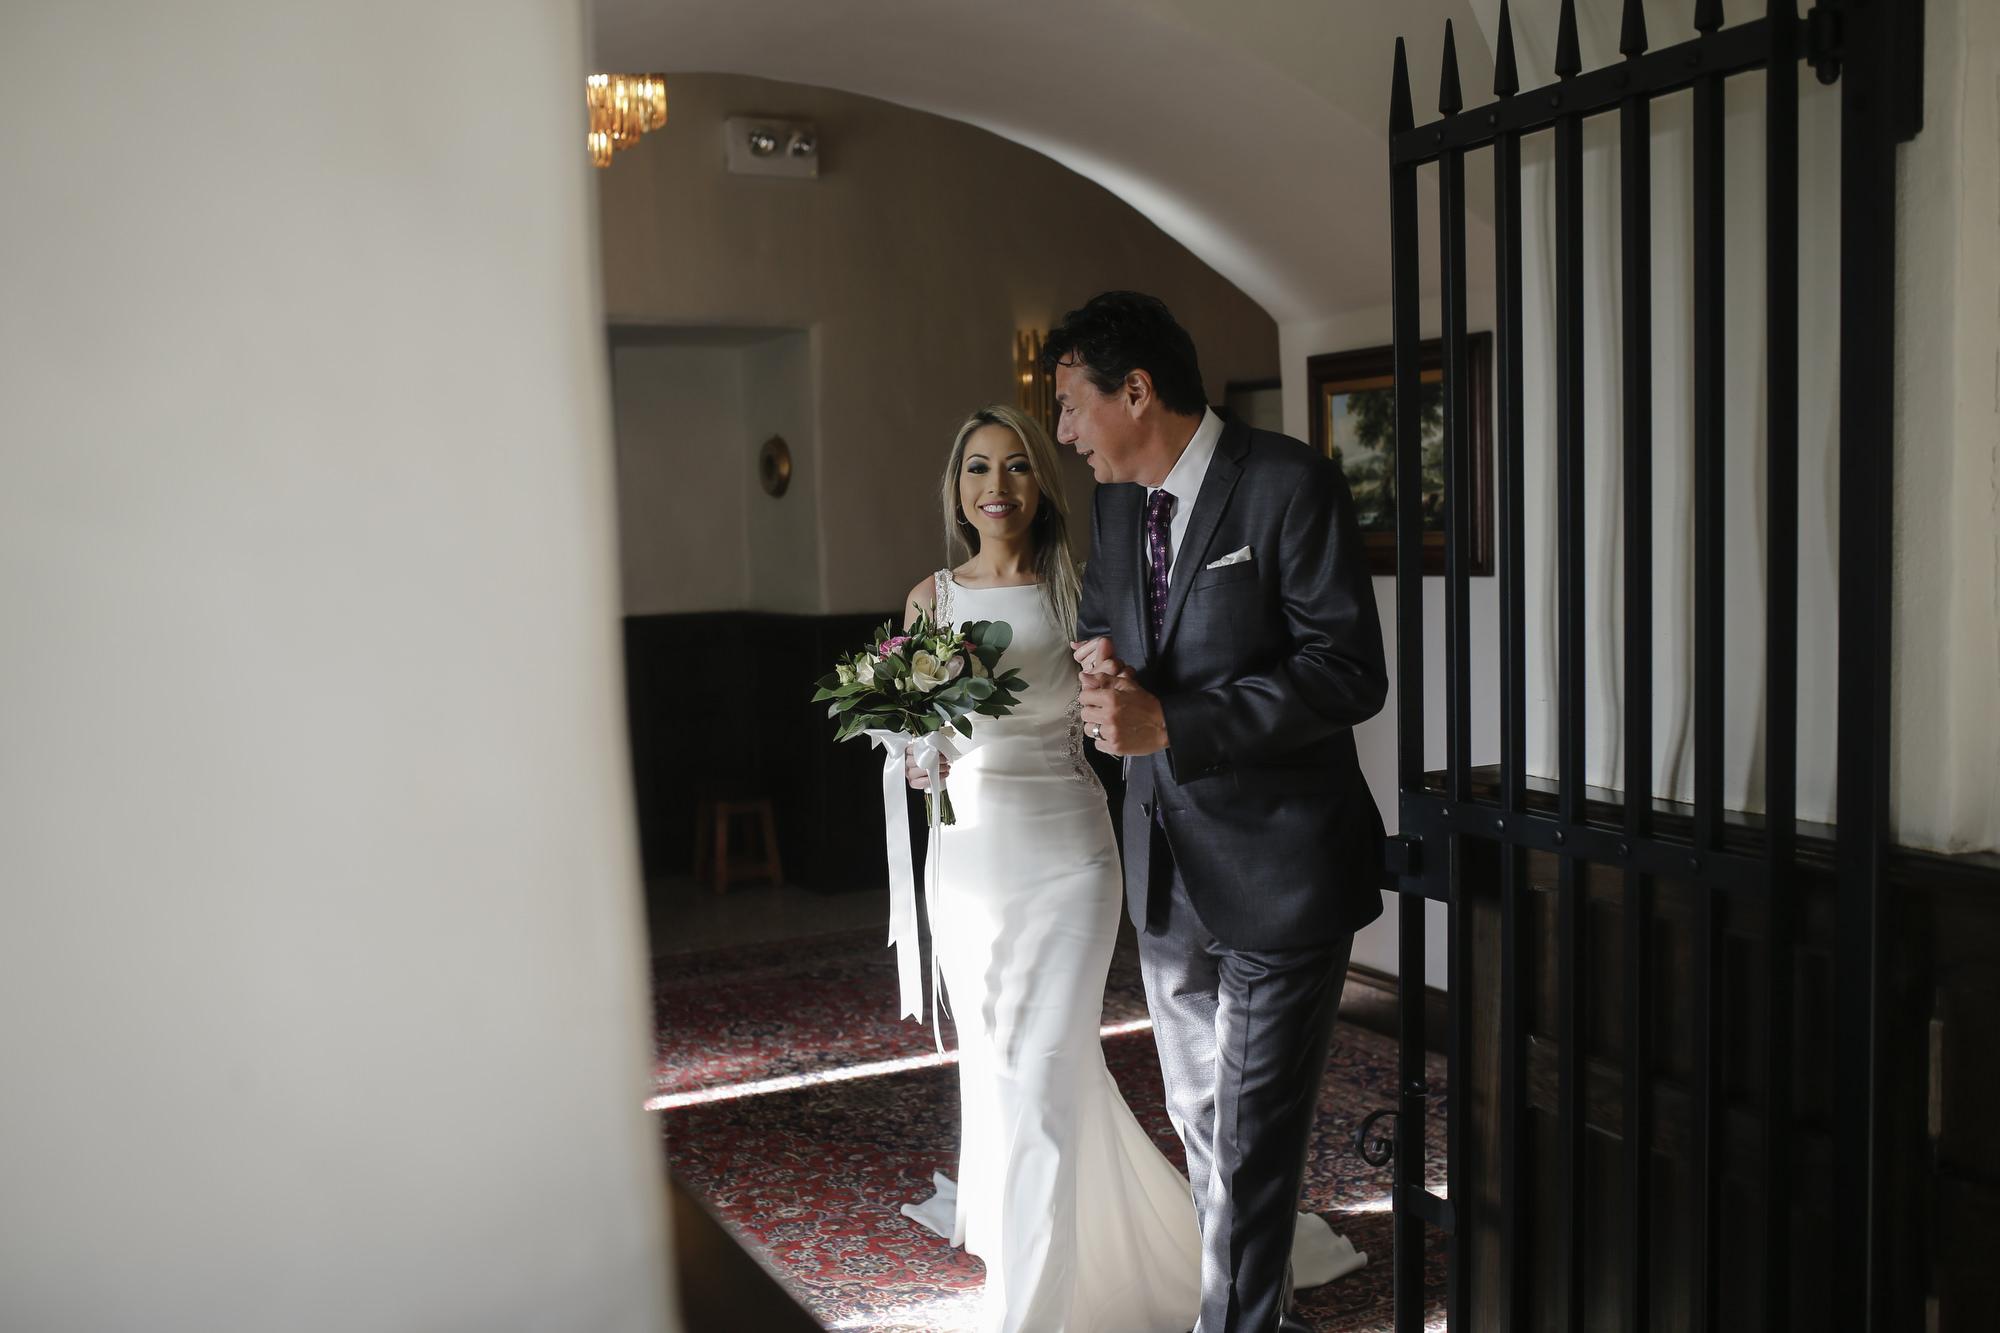 kilkea_castle_wedding_photographer_goldenmoments_019.jpg